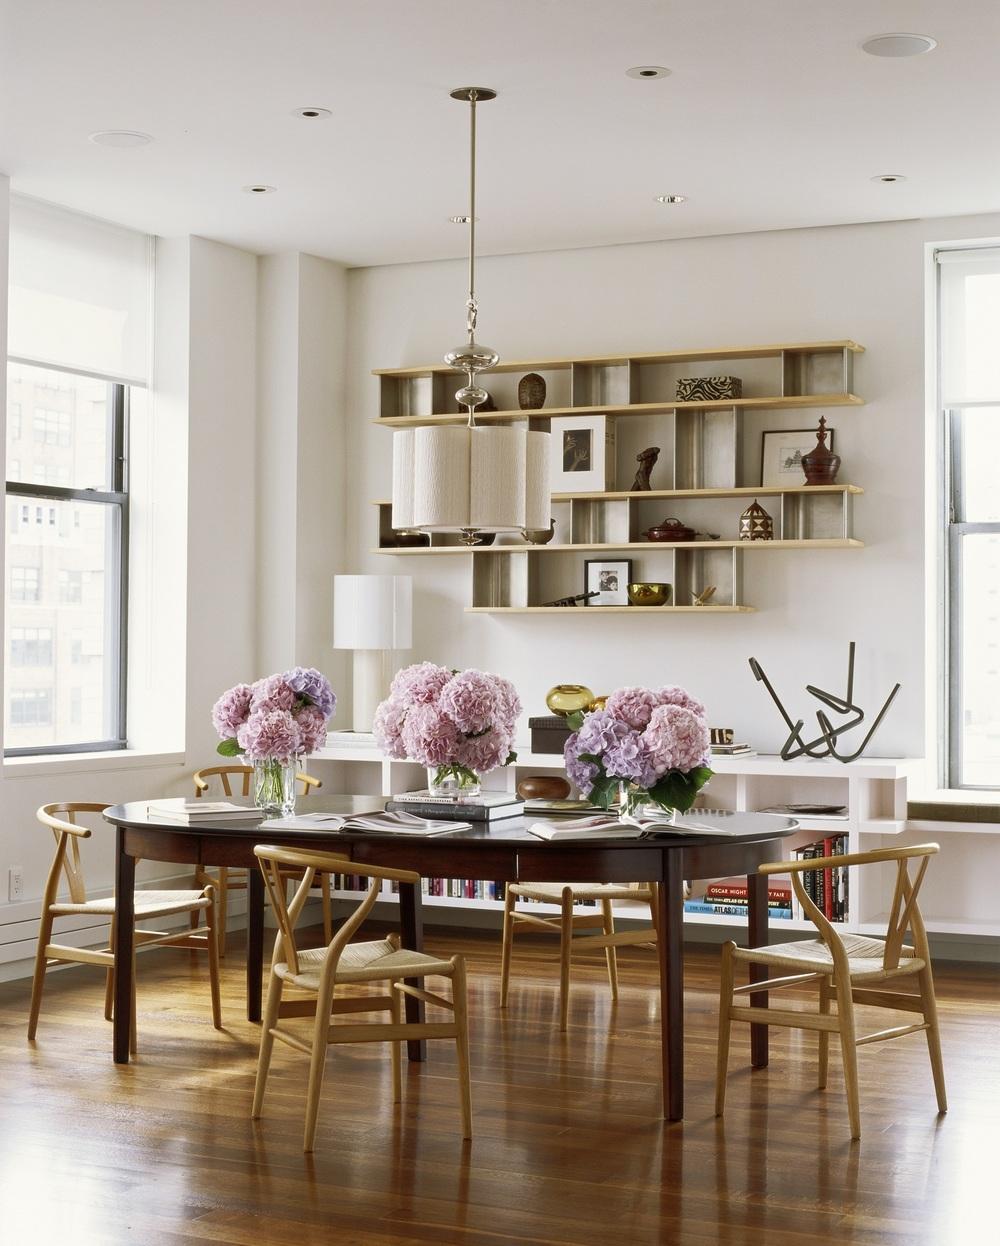 55 Dining Room Wall Decor Ideas: Peter Pawlak Design Studio